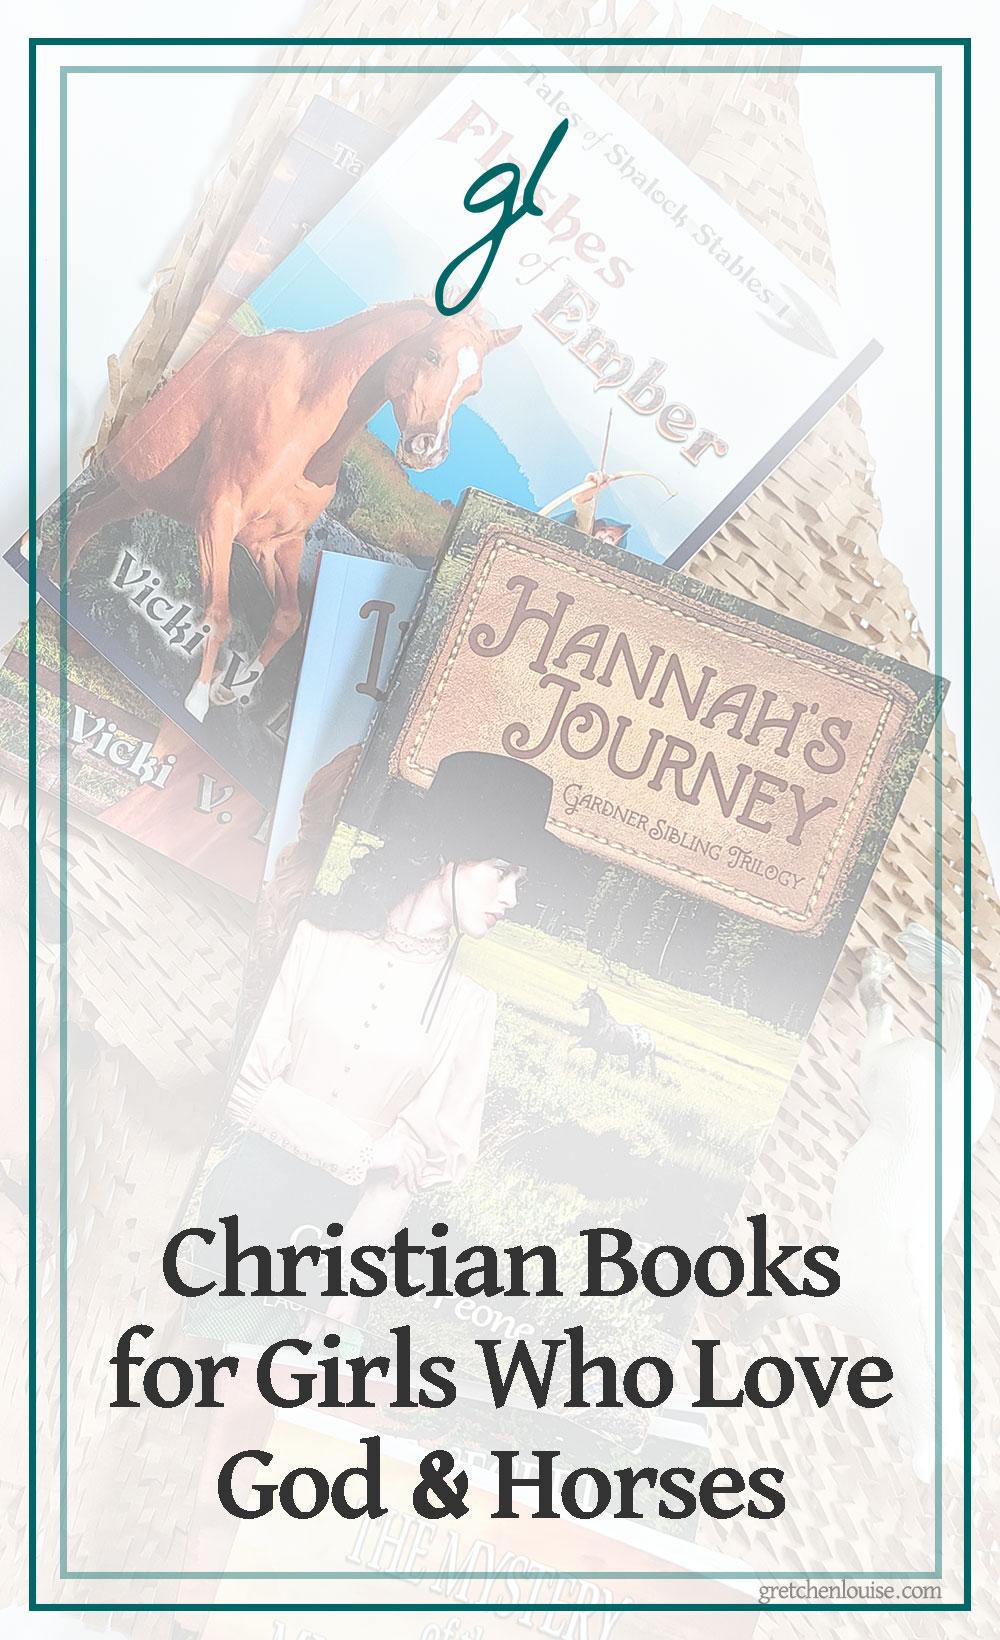 Christian Books for Girls Who Love God and Horses via @GretLouise